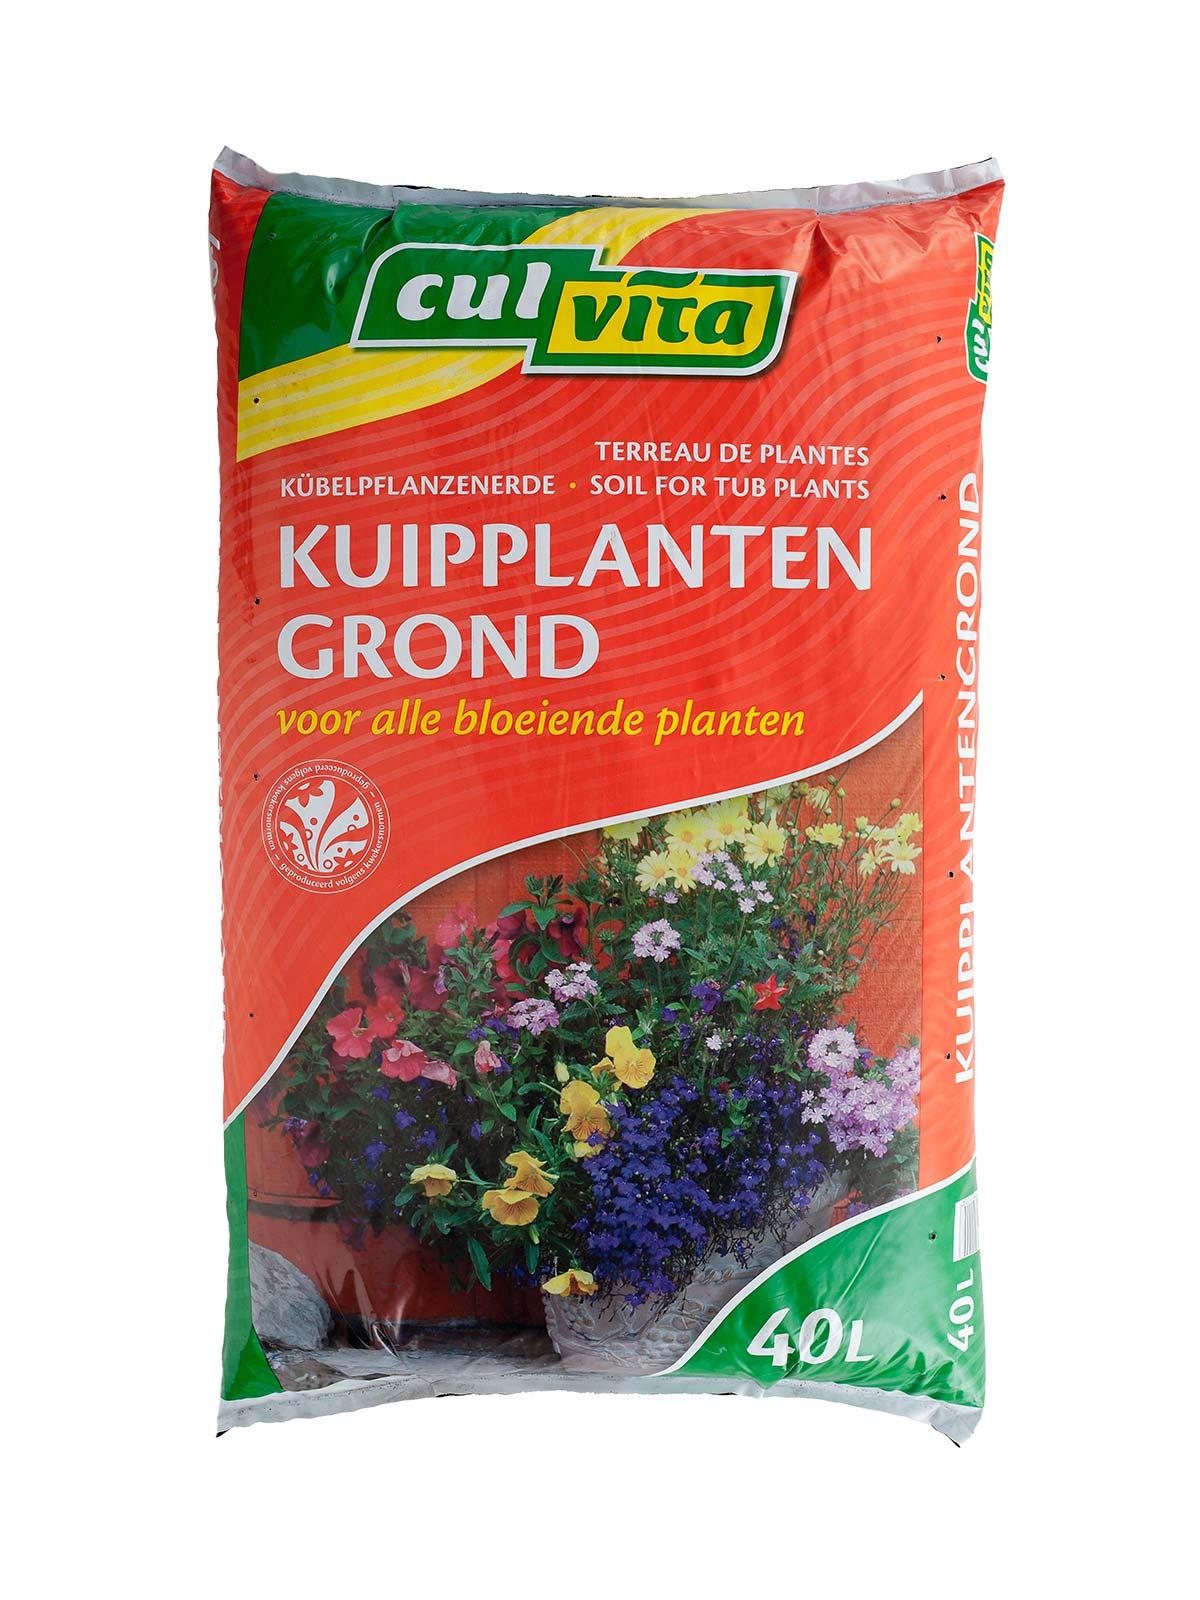 Culvita Kuipplantengrond | Culvita.nl